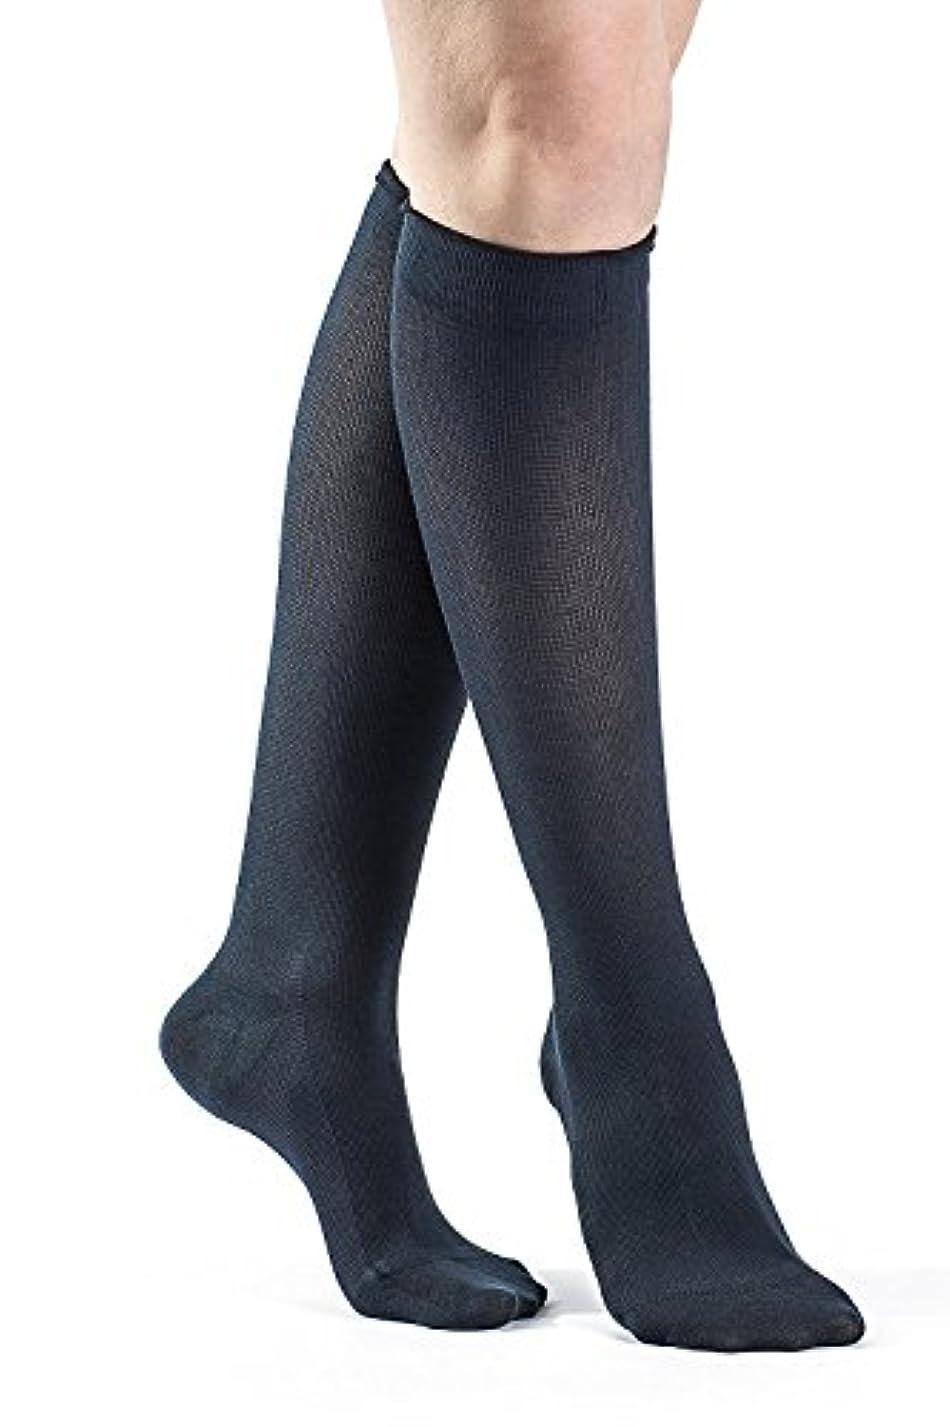 逸話周術期論争Sigvaris Sea Island Cotton 151CC10 15-20mmHg Womens Closed Toe, Calf Socks - Navy, Size C